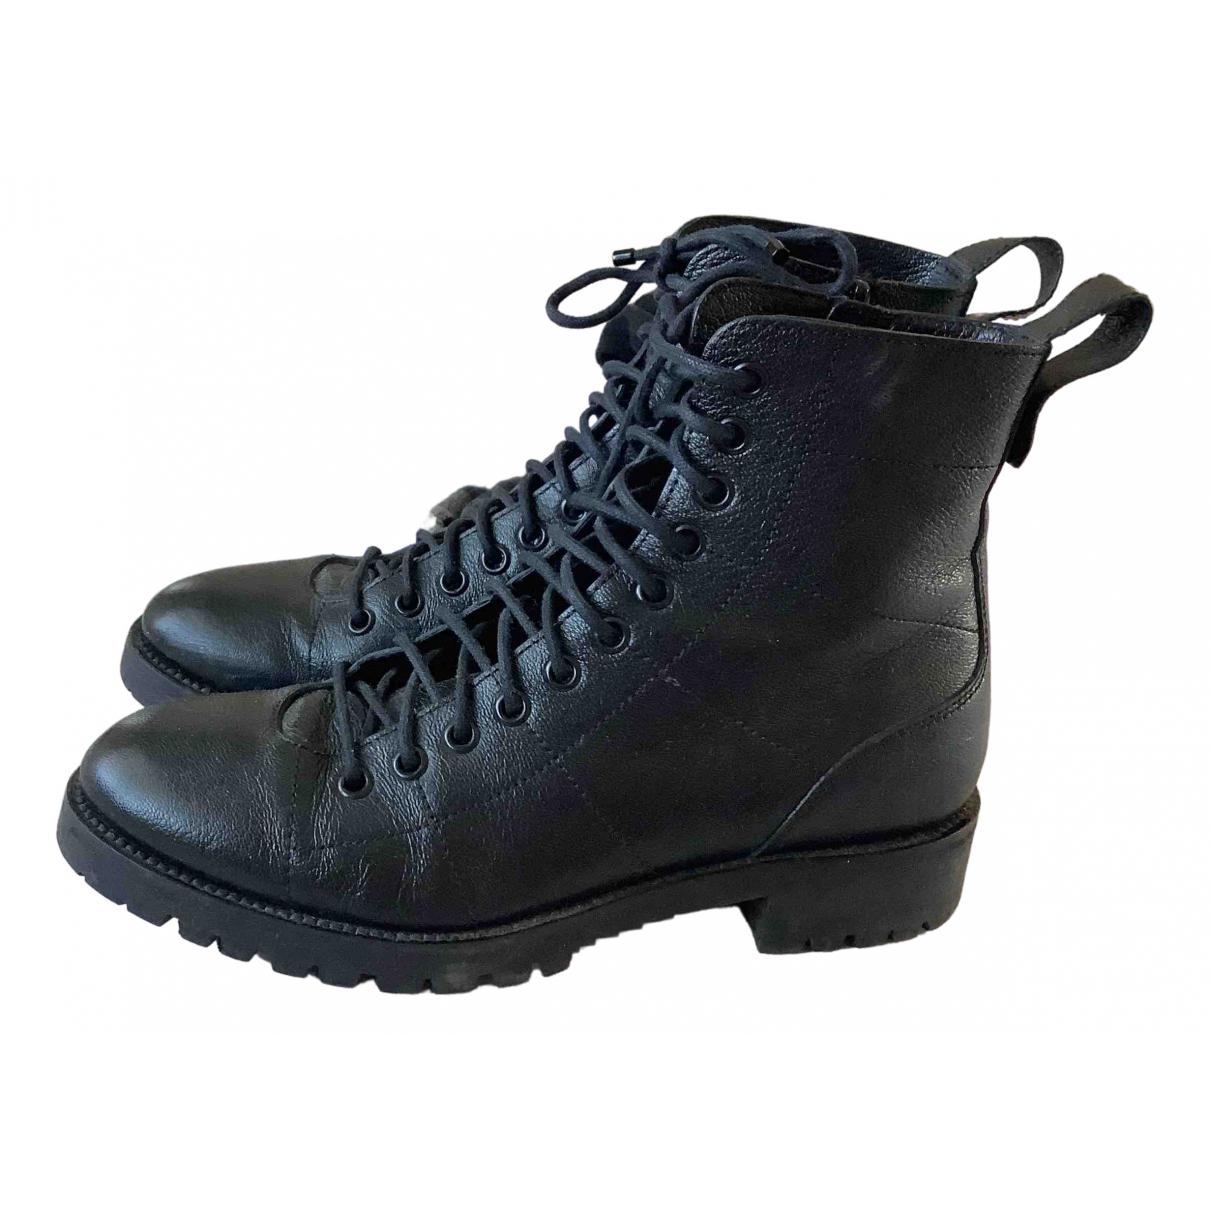 Jimmy Choo \N Black Leather Boots for Women 37.5 EU